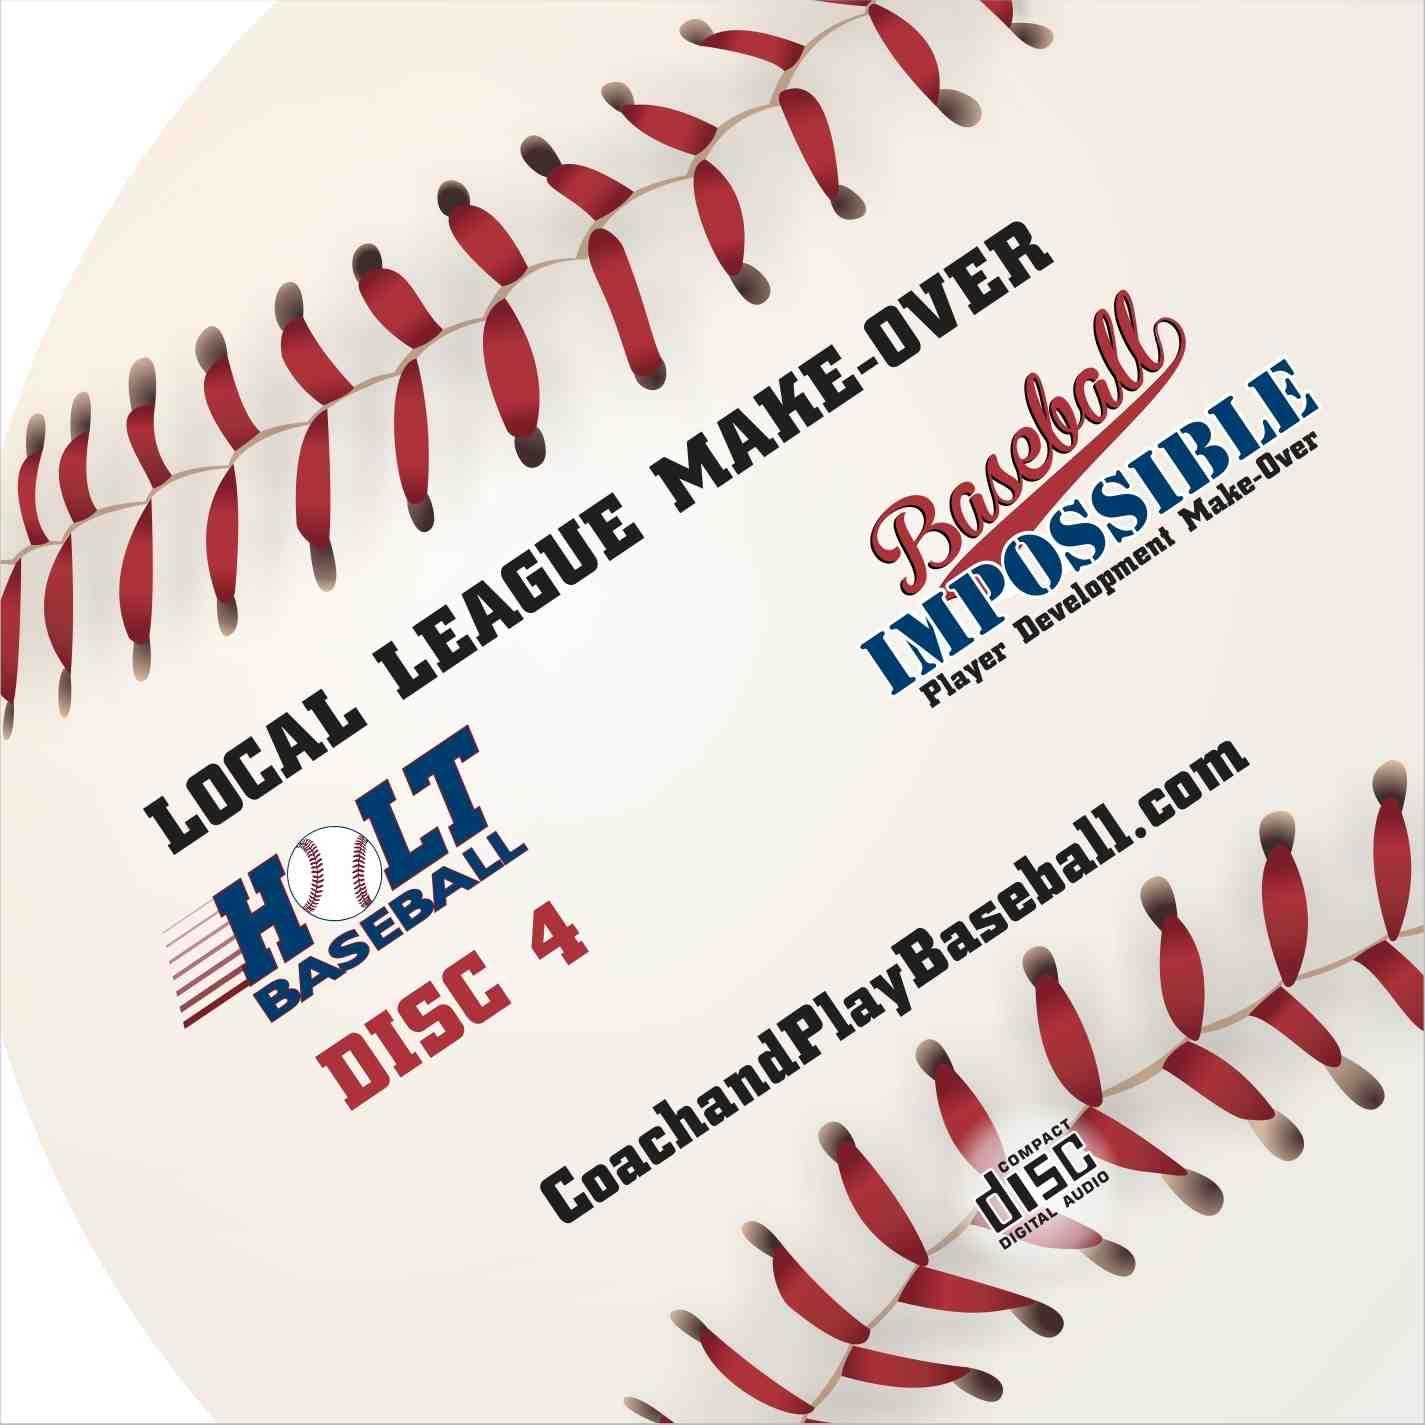 local Minor League Make-Over Youth Baseball